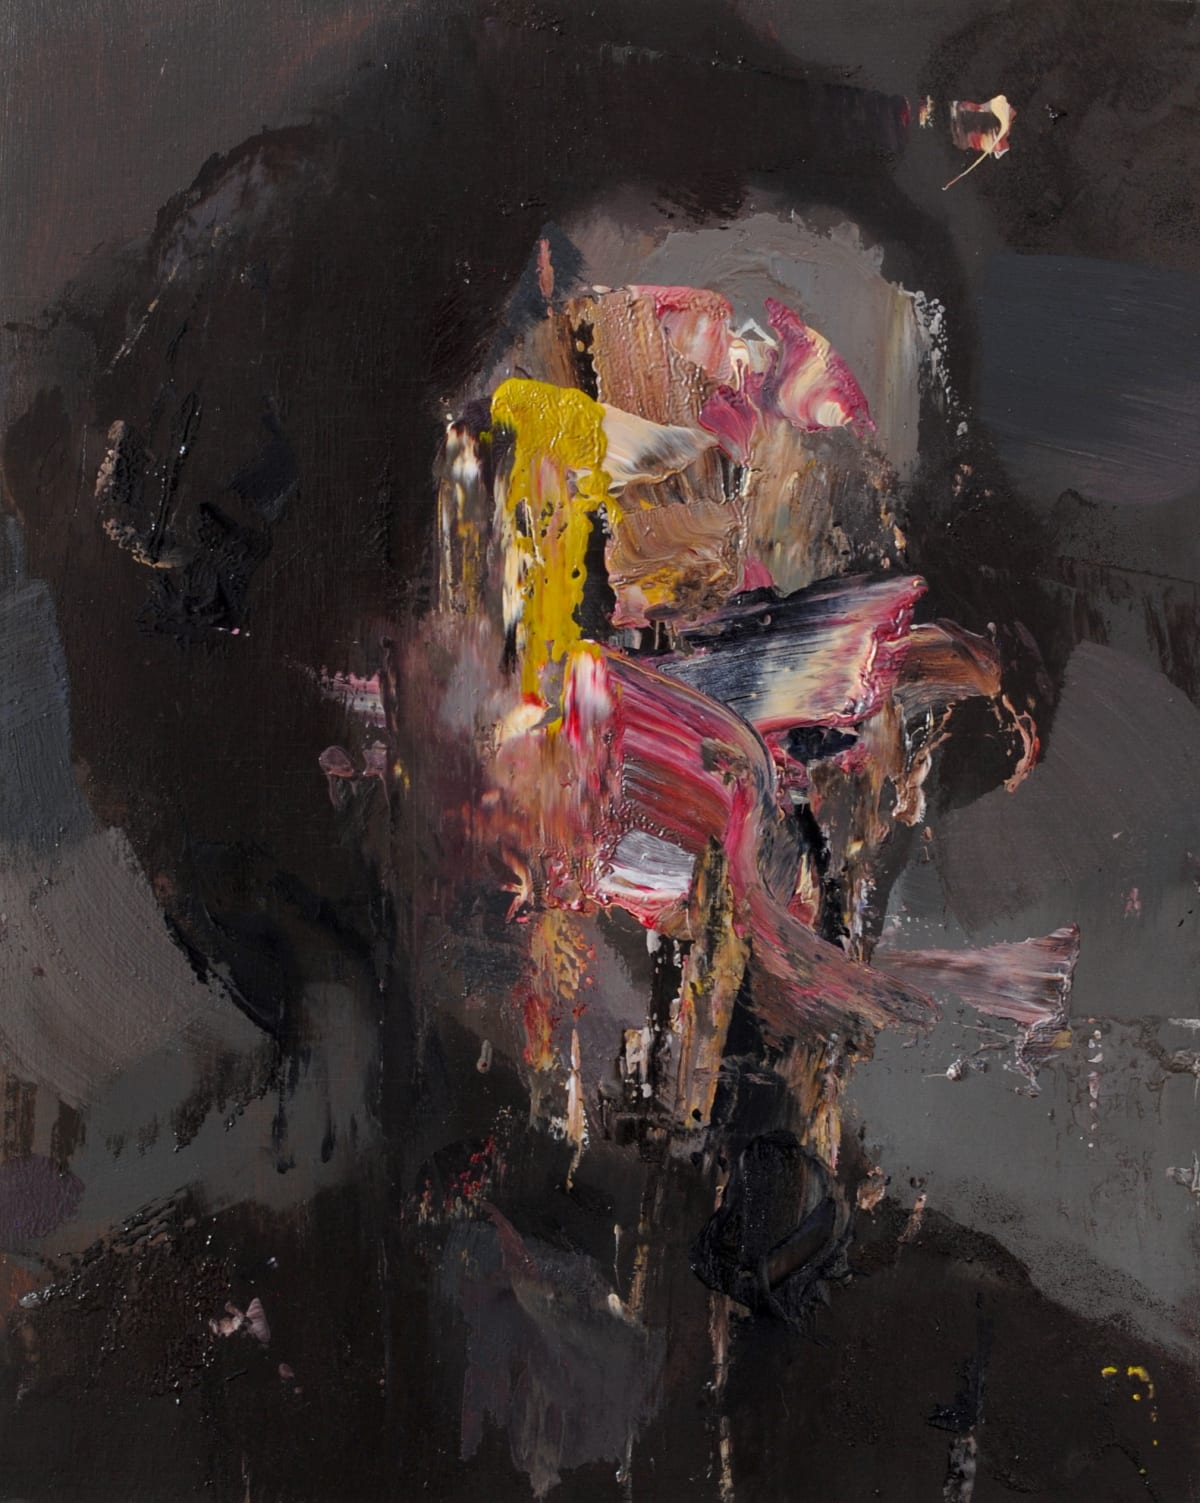 Jean-Luc Almond, Faceless, 2018